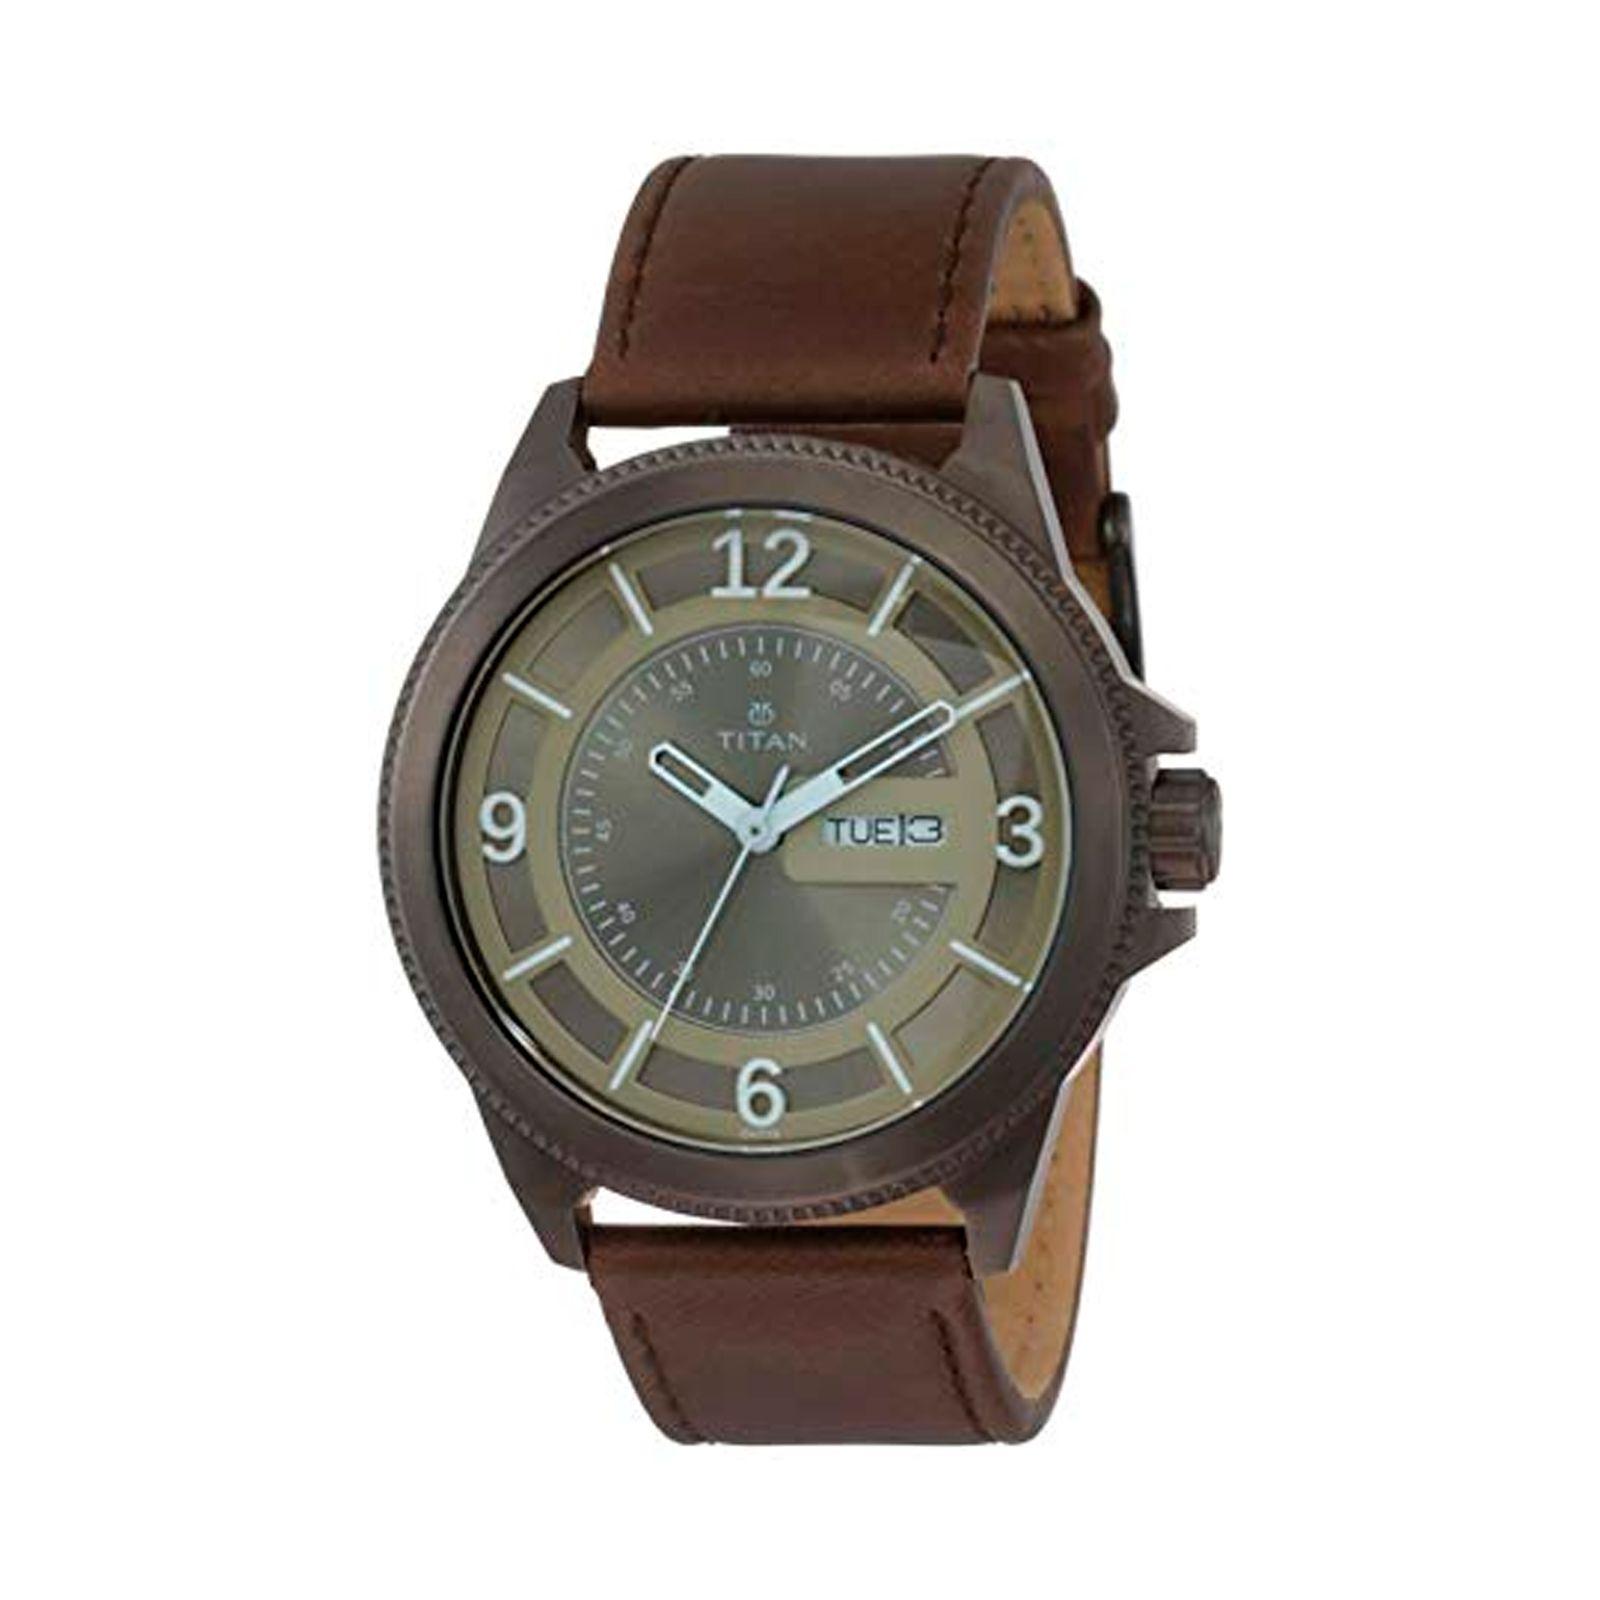 ساعت مچی عقربه ای مردانه تیتان مدل T1701QL04 -  - 2